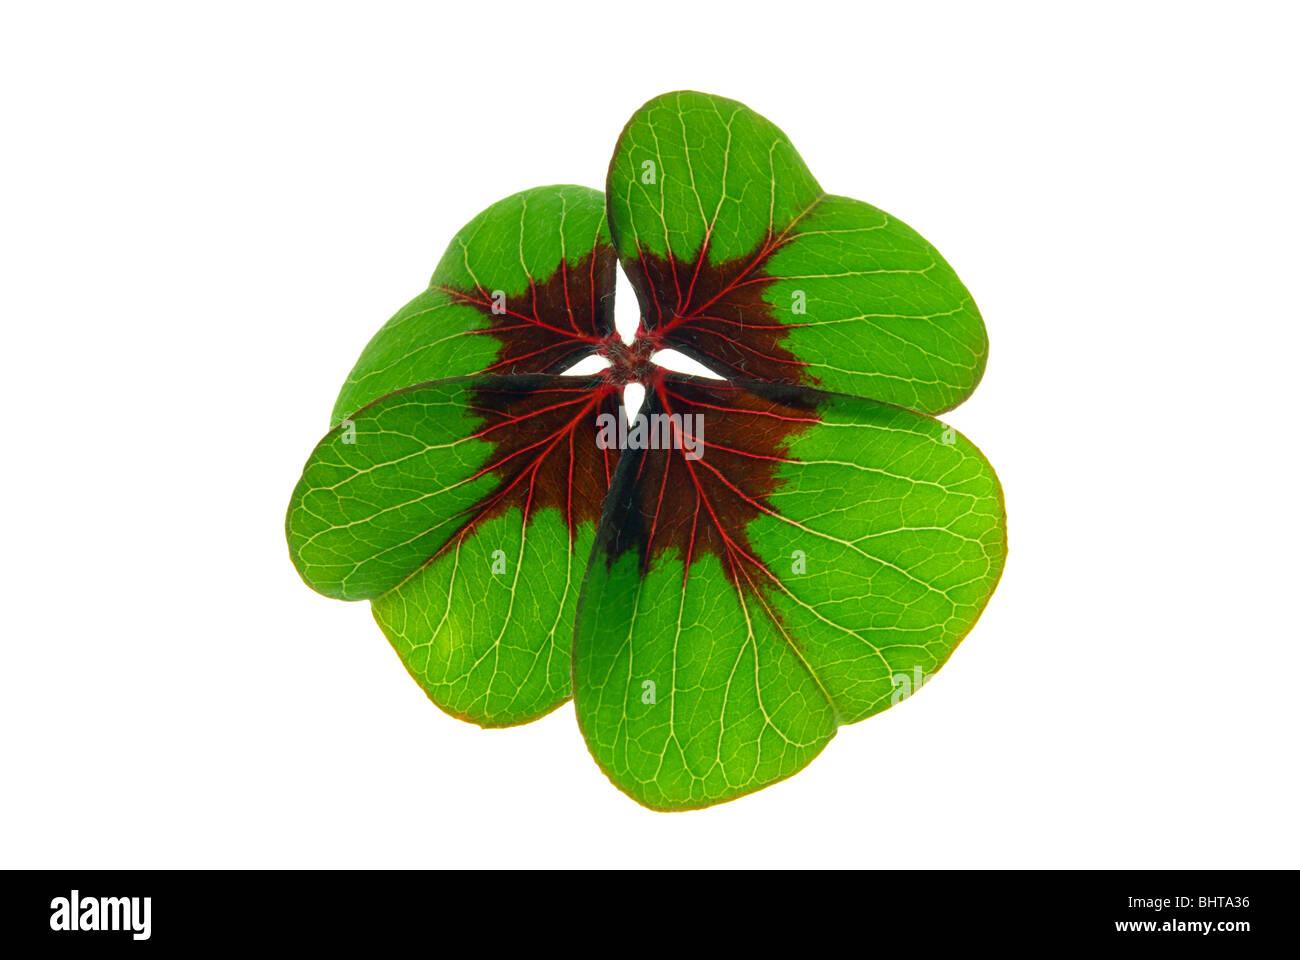 Glücksklee - four leafed clover 29 Stock Photo